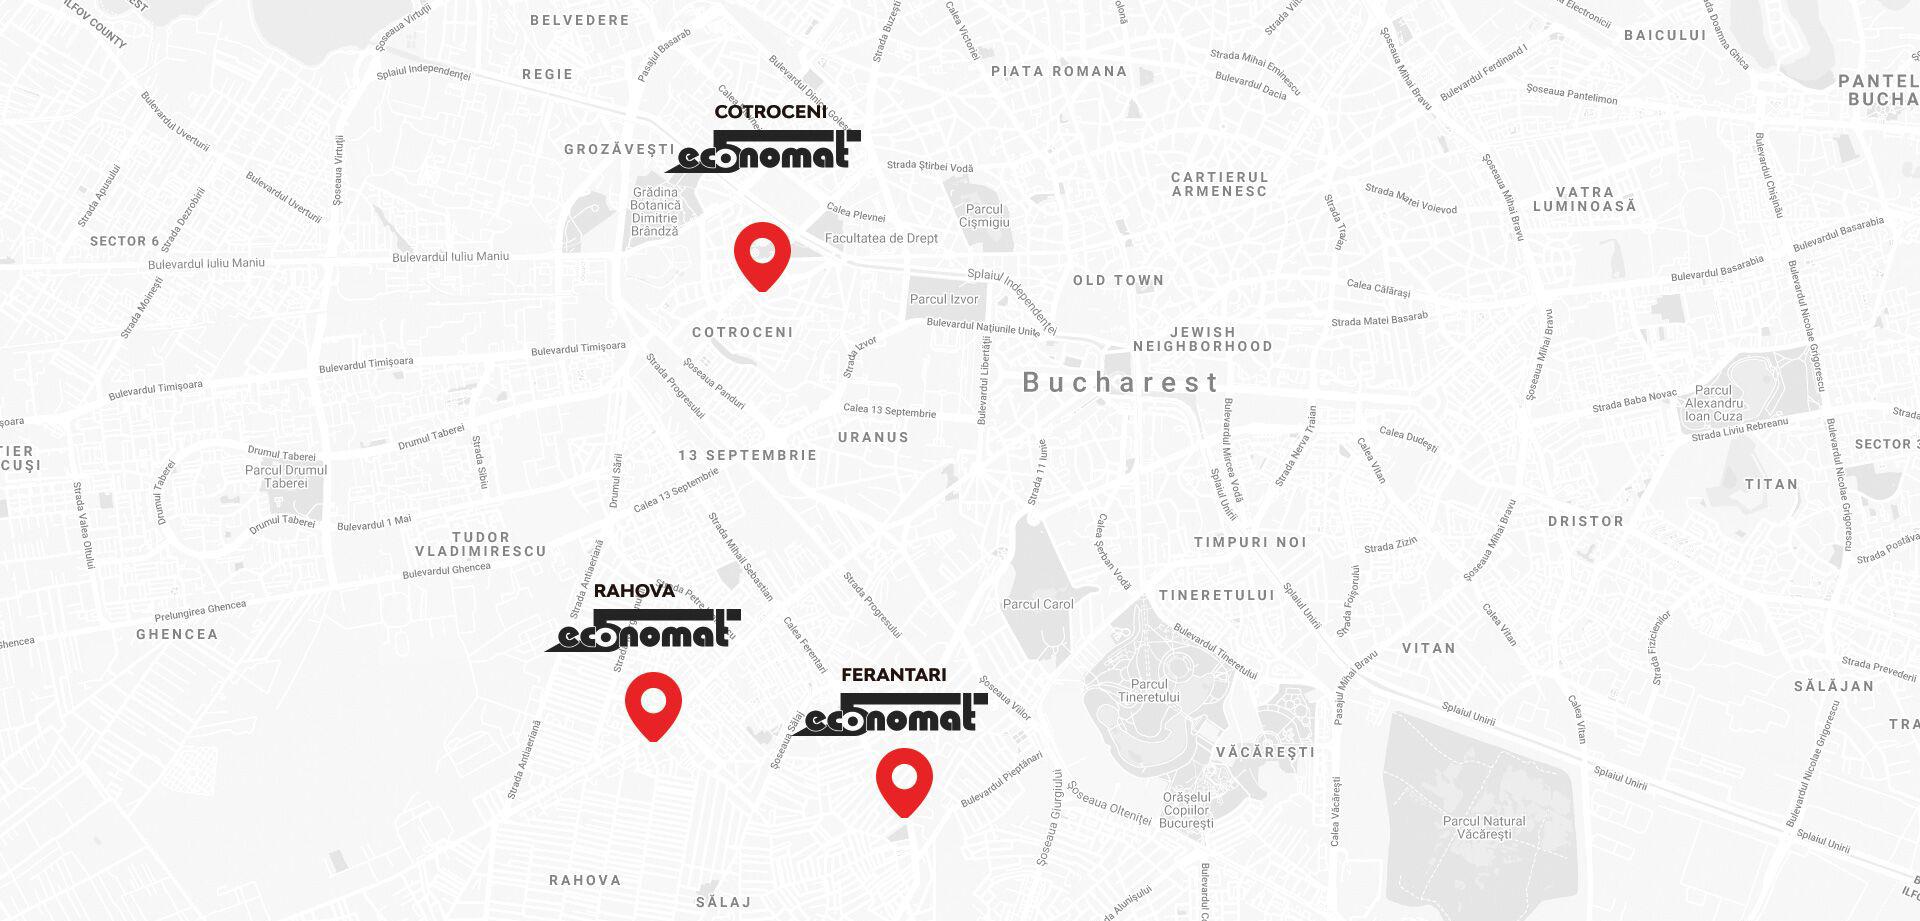 Economat map